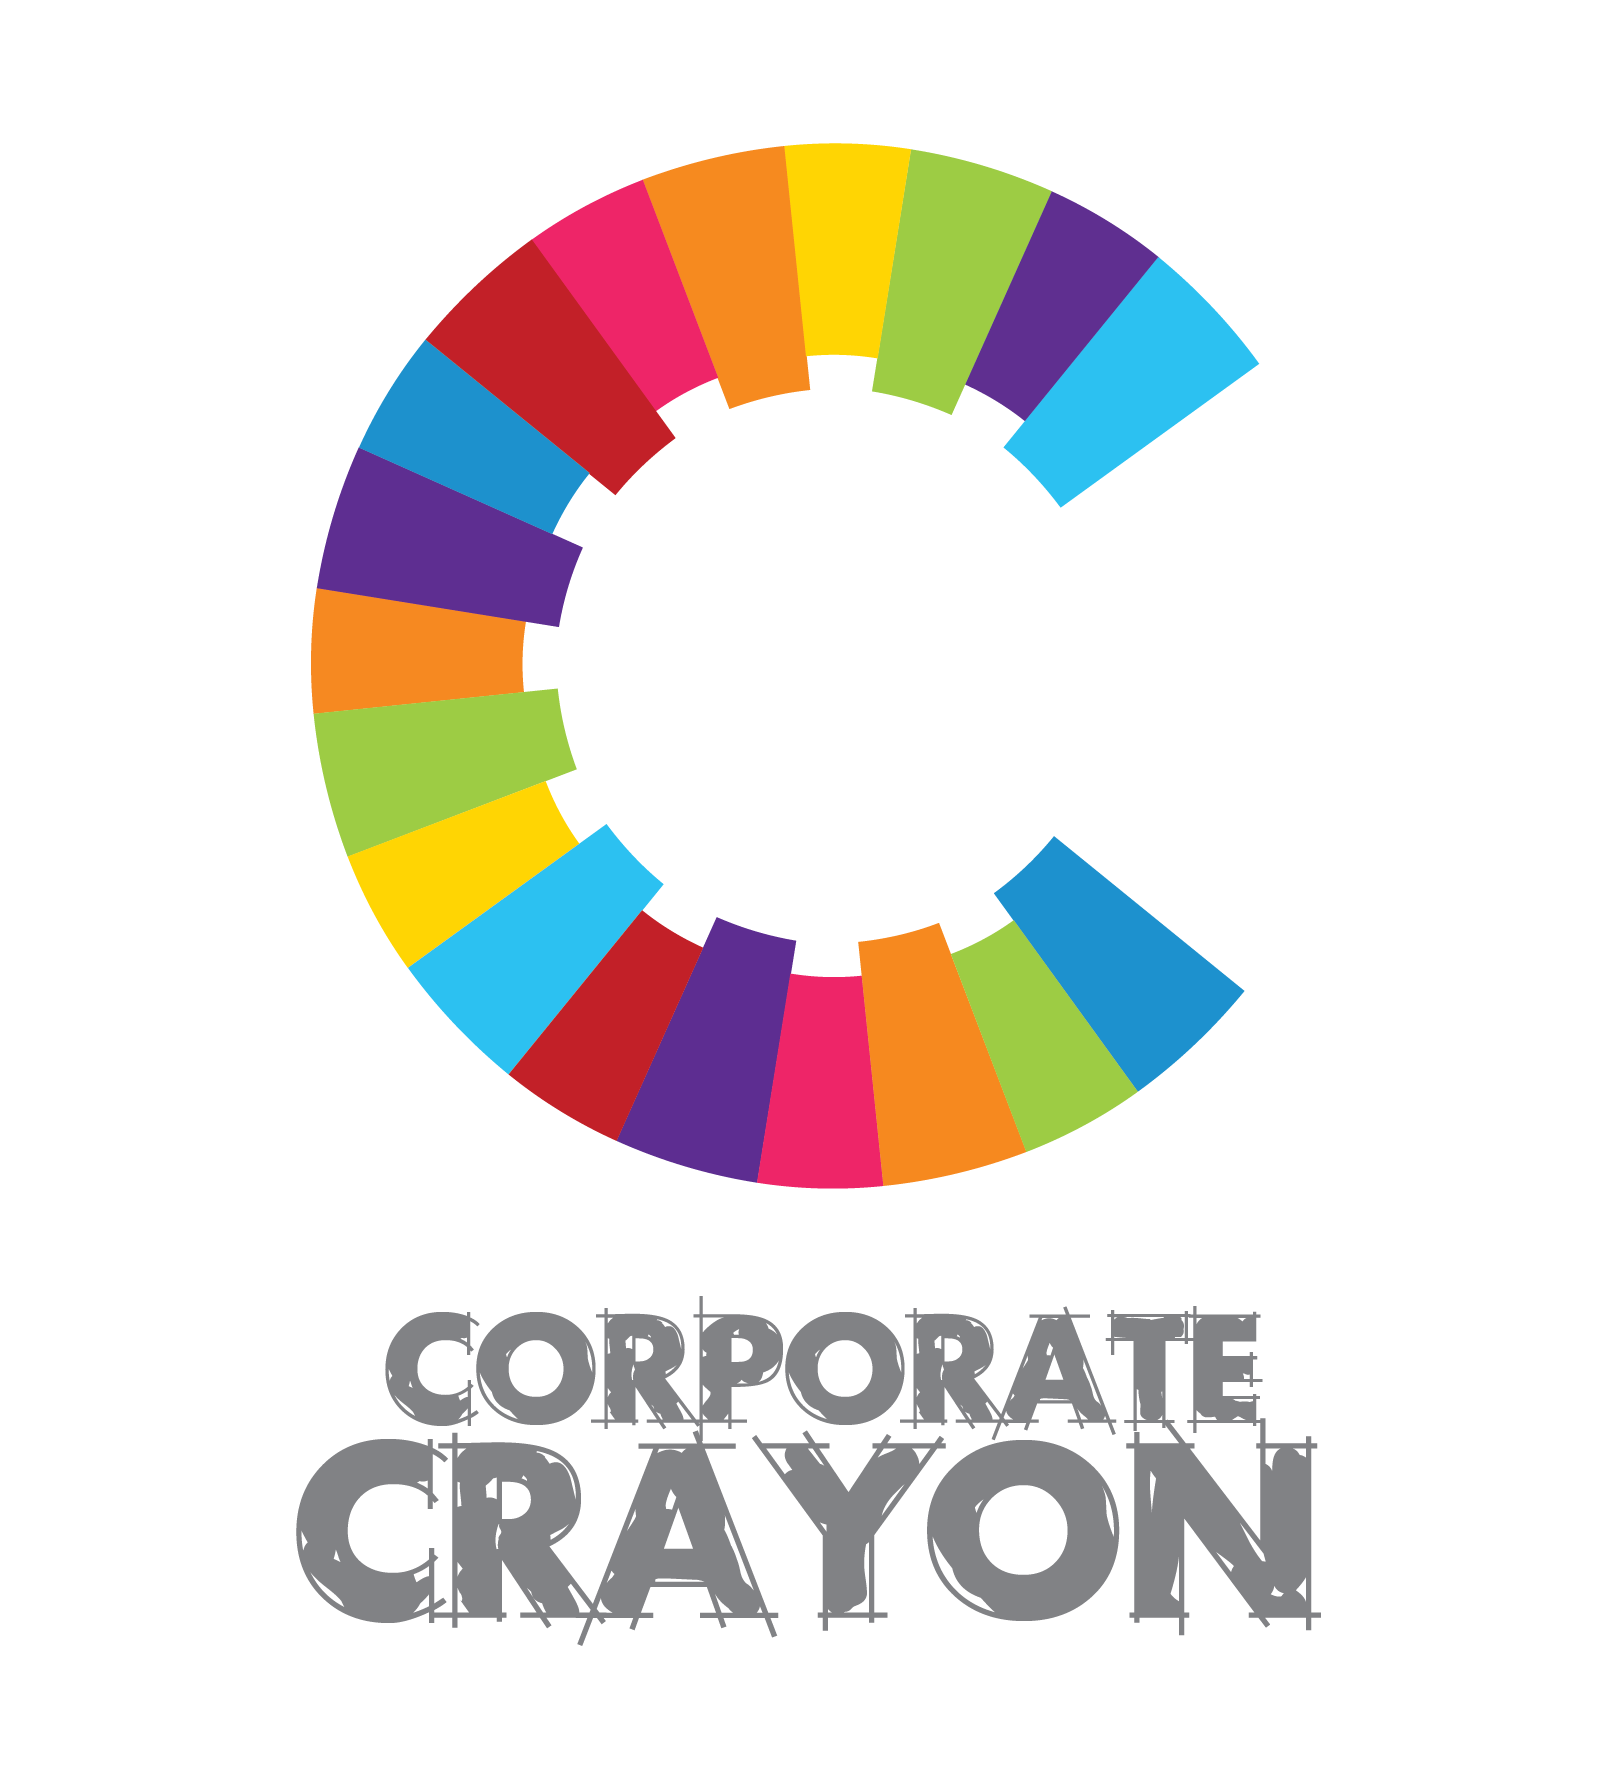 Circle clipart crayon. Corporate creating purposeful play